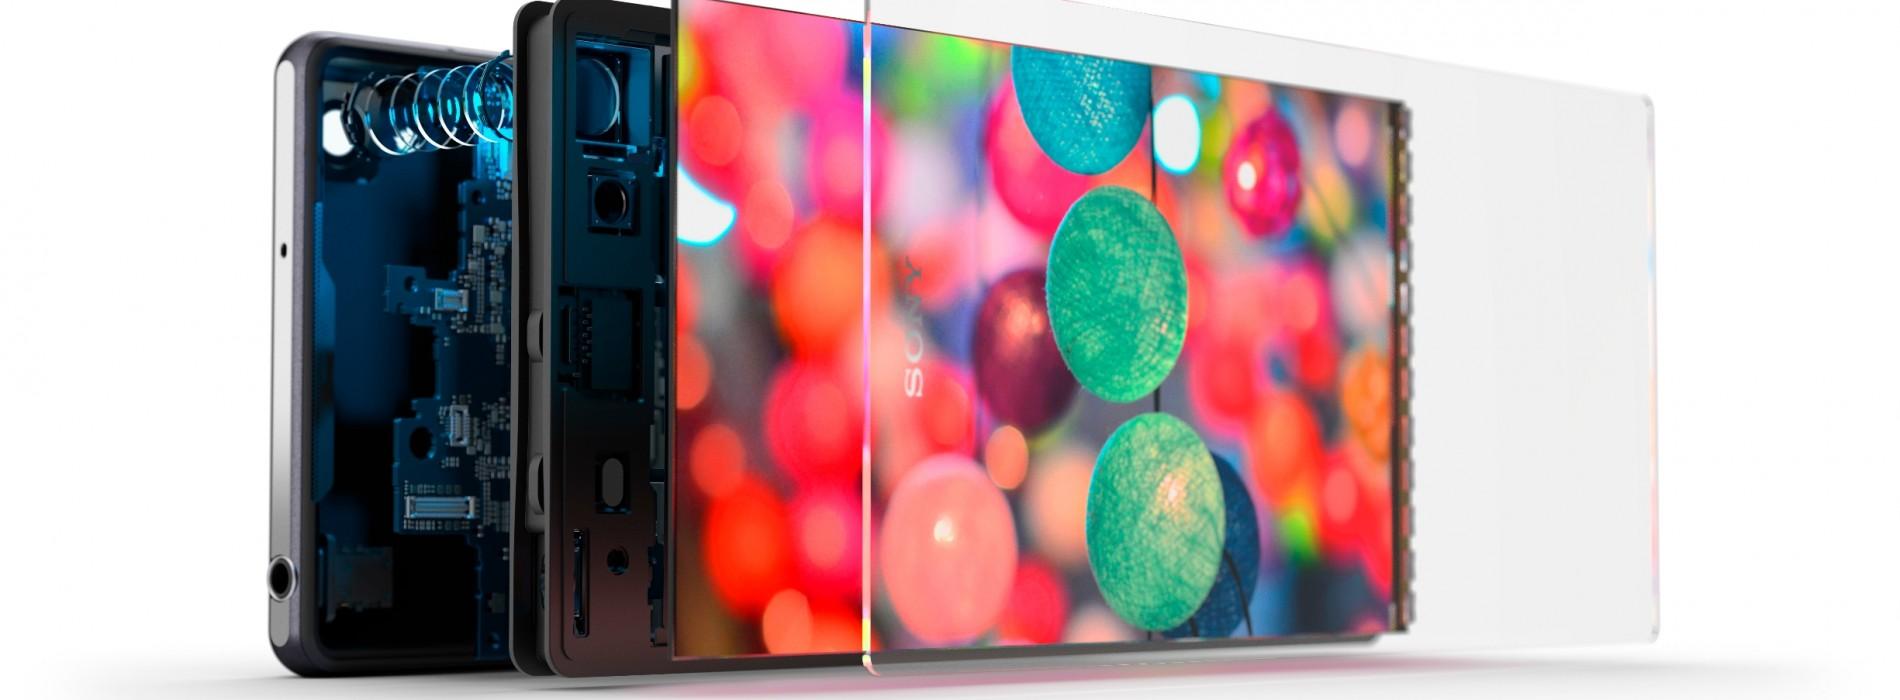 Sony Xperia Z2 gallery